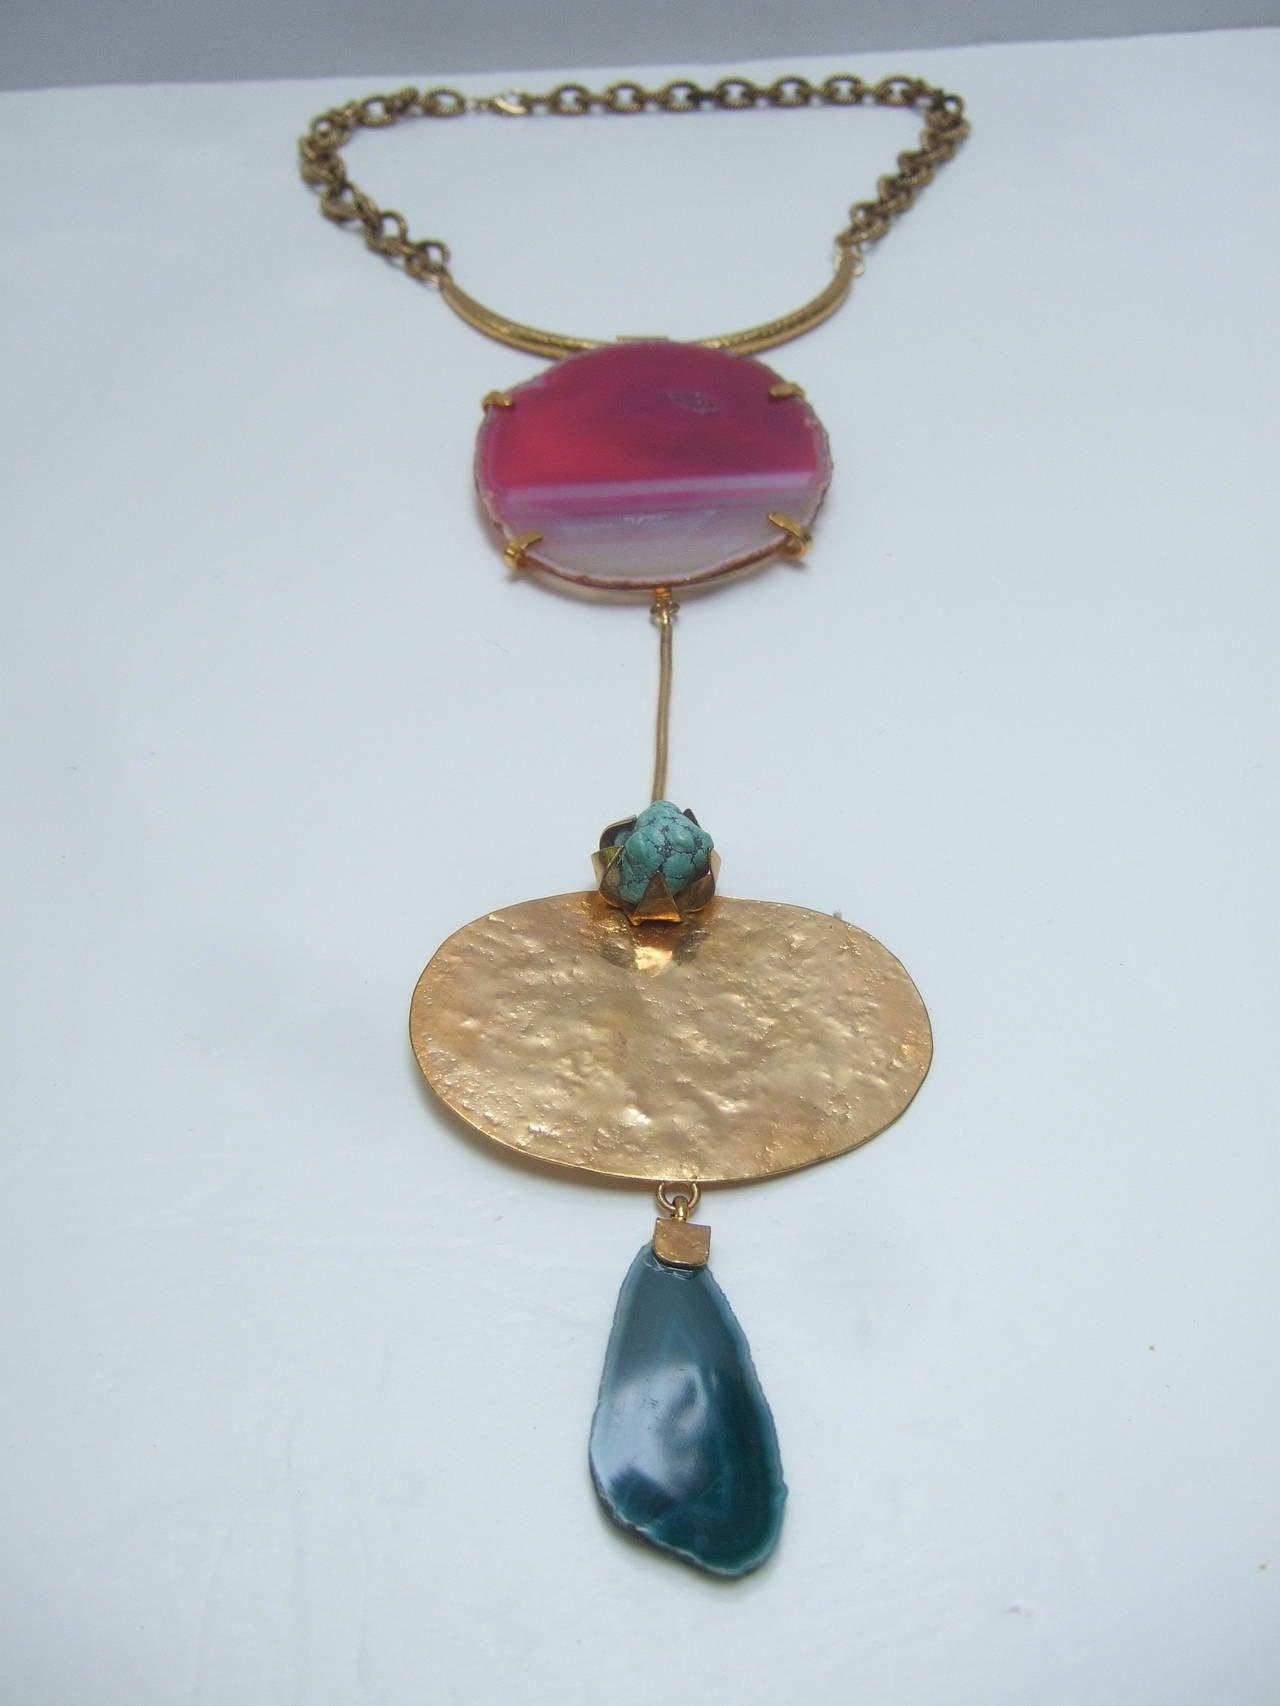 Philippe Ferrandis Paris Magnificent Agate Pendant Necklace In Excellent Condition For Sale In Santa Barbara, CA